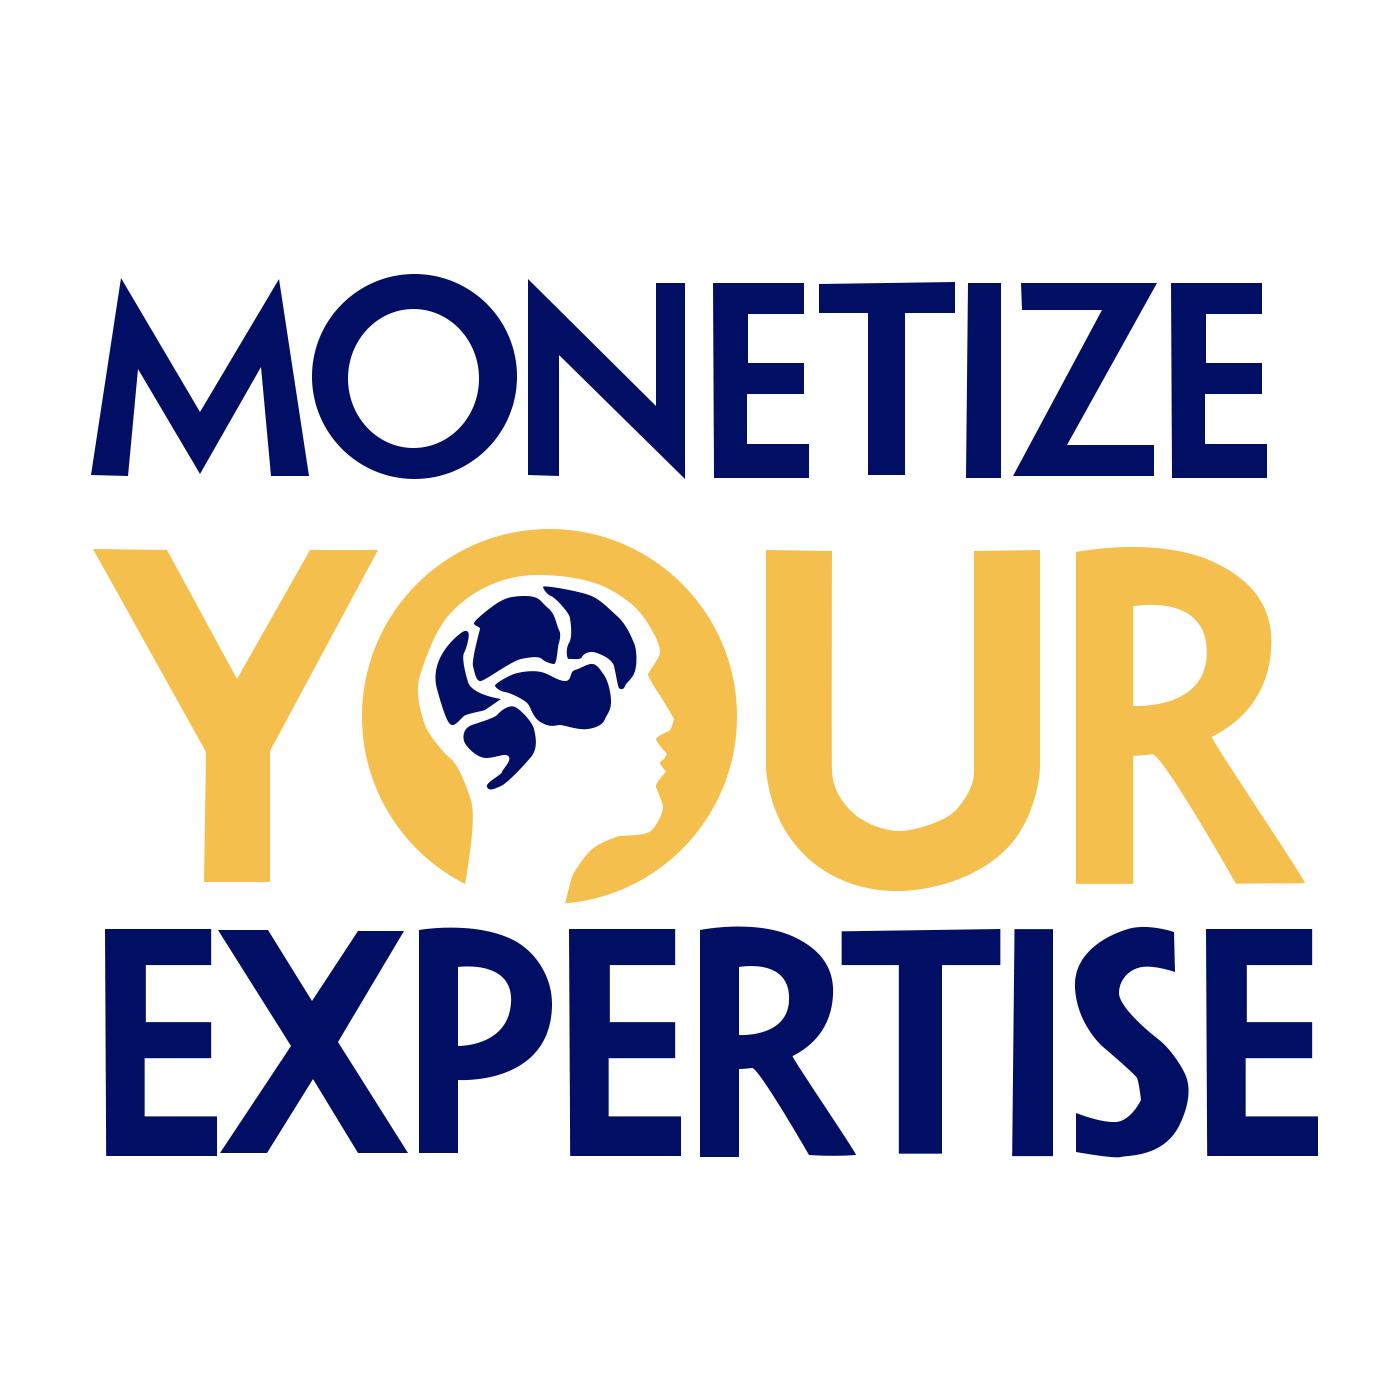 Monetize Your Expertise   Create Online Courses   Form Membership Communities   Build Profitable Info Products show art